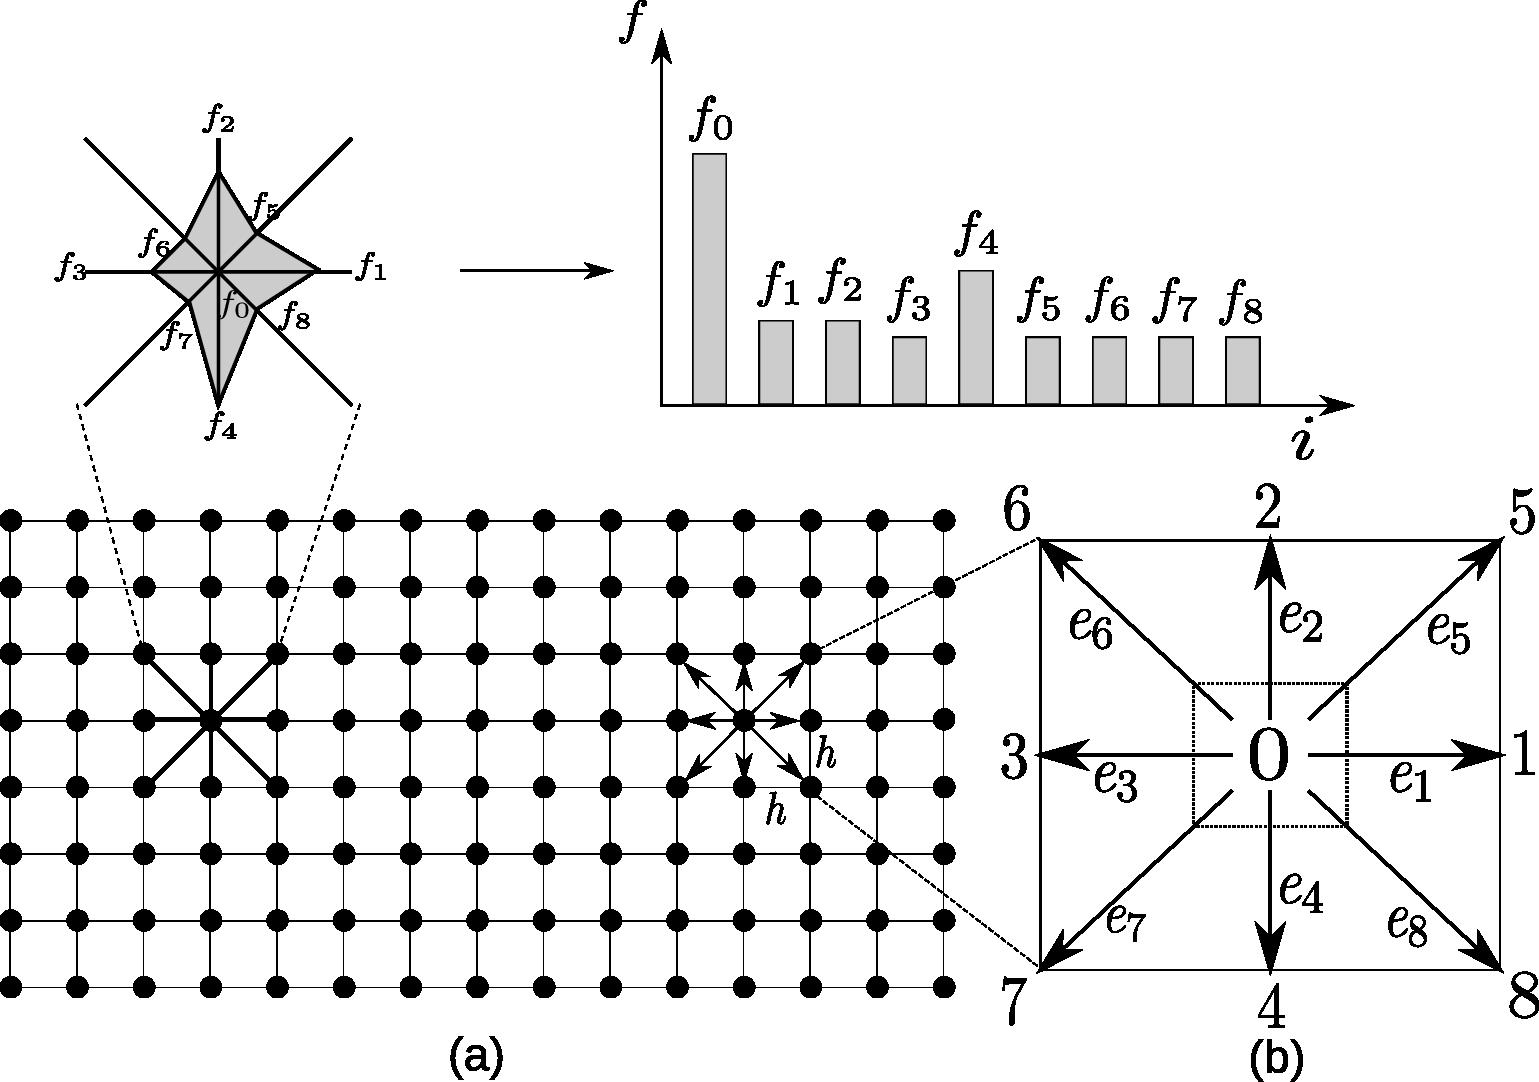 The Lattice Boltzmann discretization and D2Q9 scheme: (a) a standard LB lattice; (b) D2Q9 model